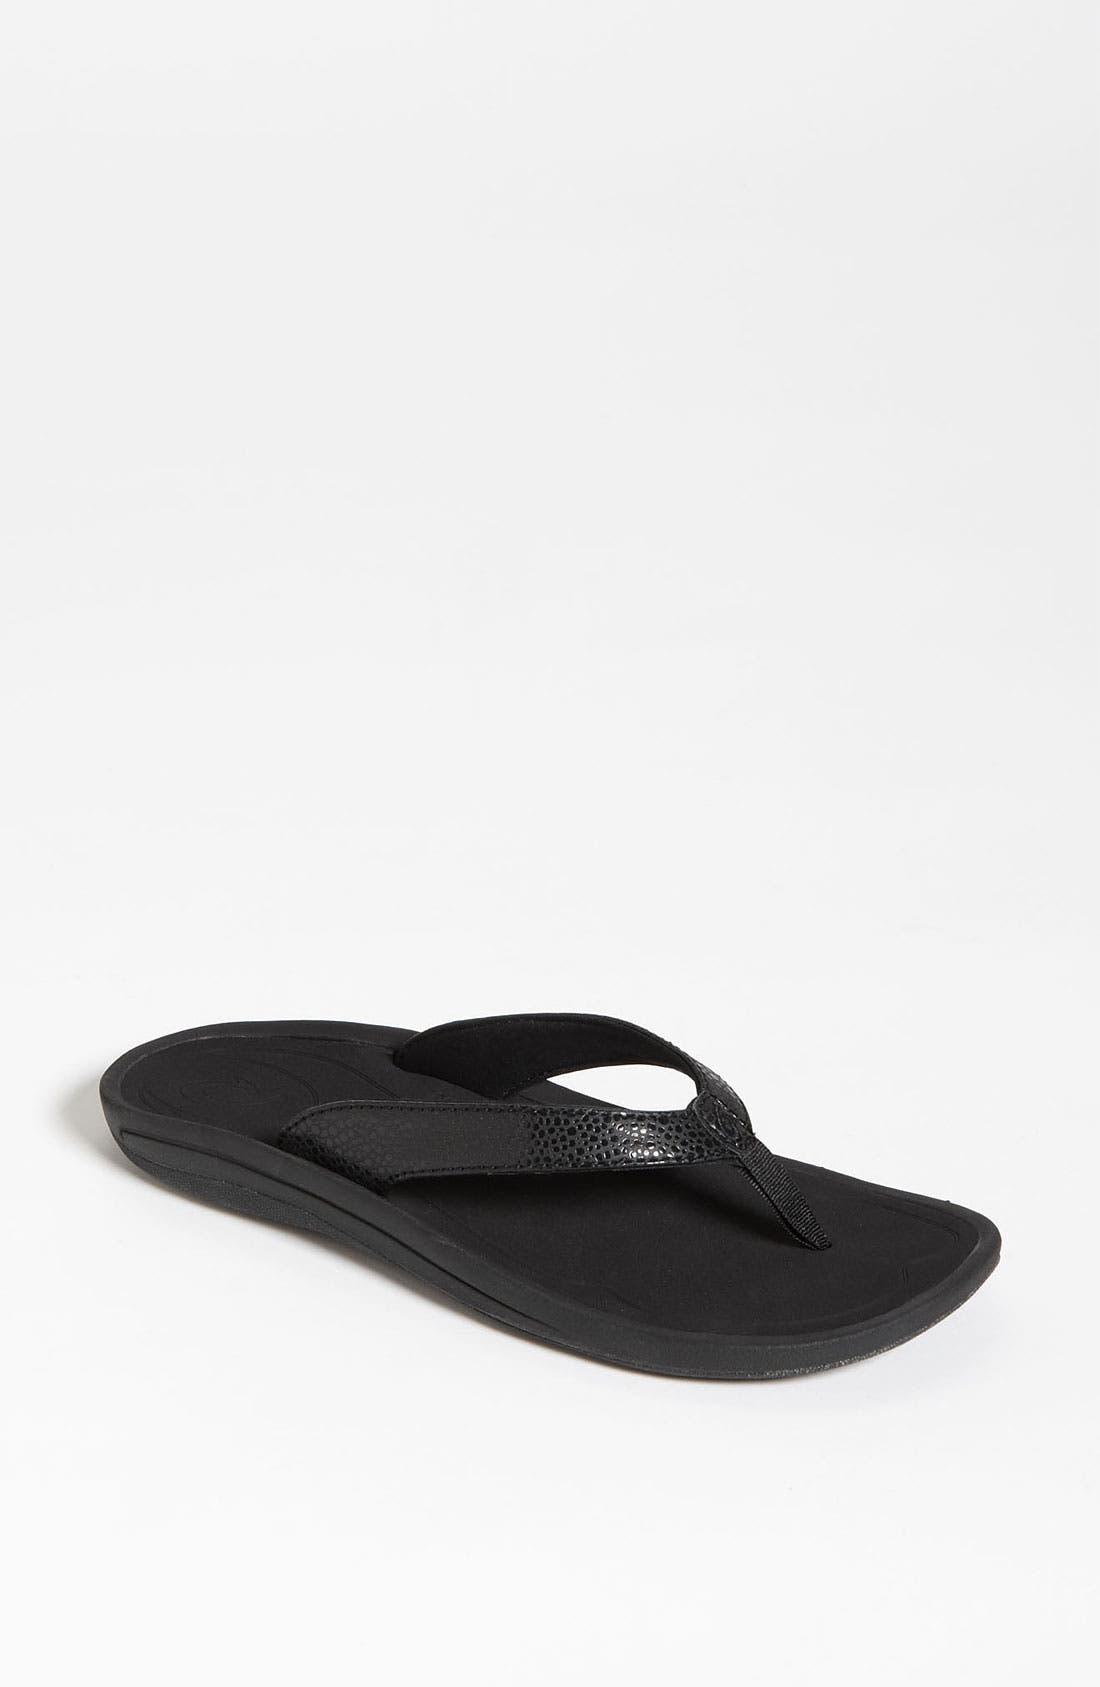 'Kulapa Kai' Thong Sandal,                         Main,                         color, Black